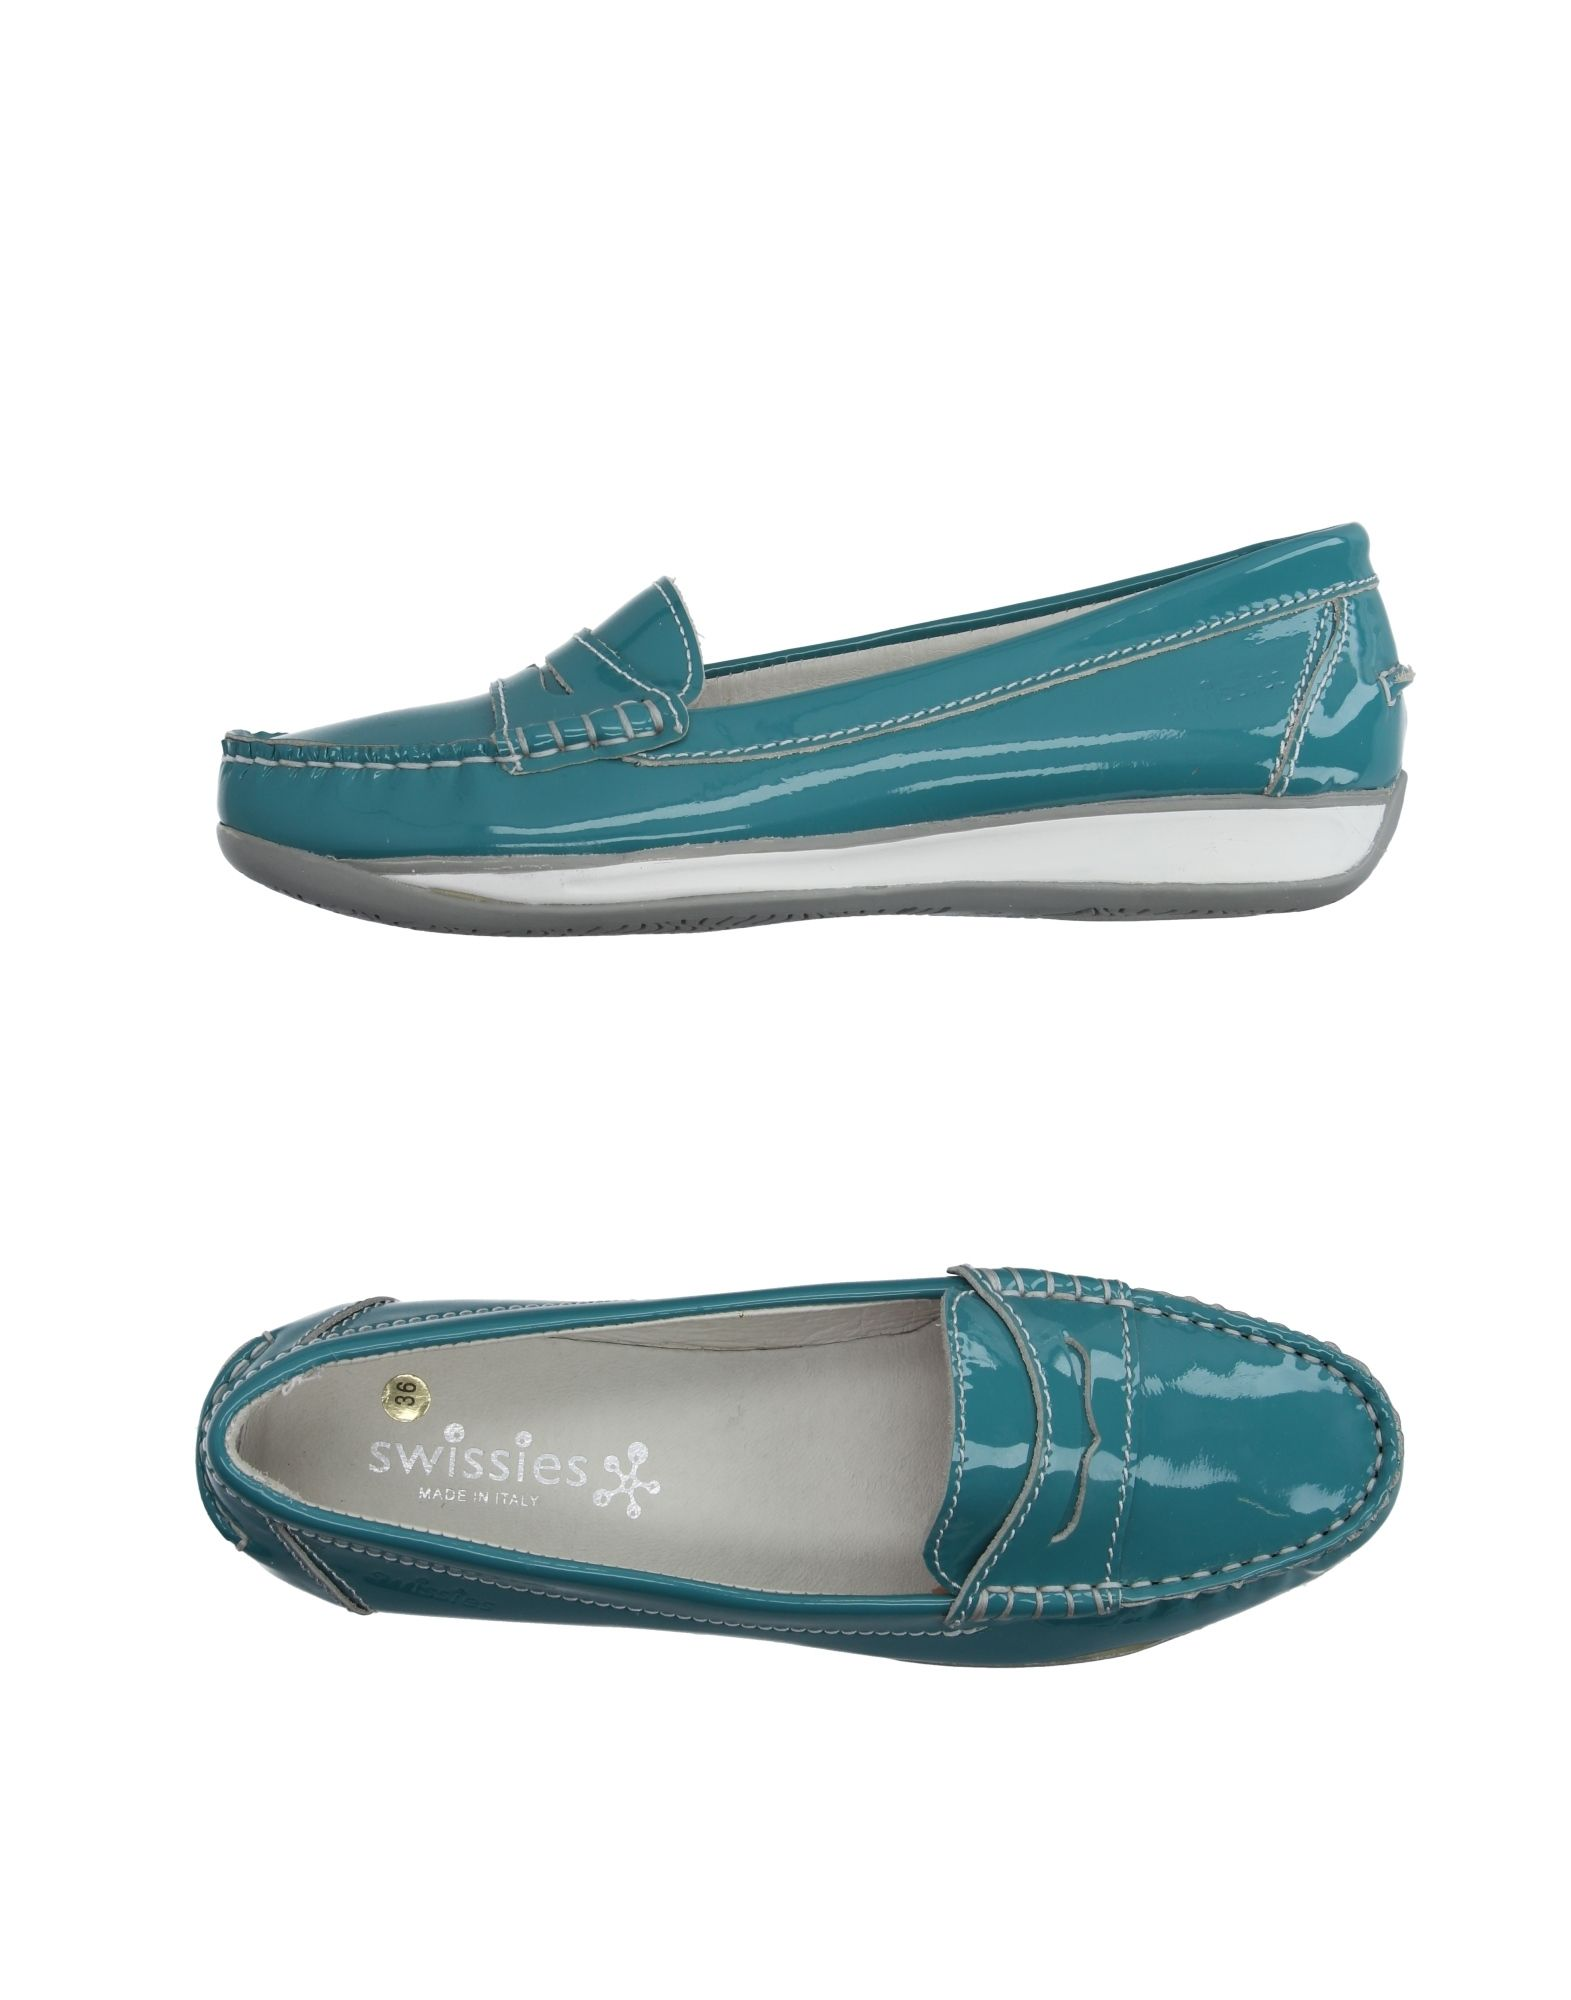 swissies female swissies loafers